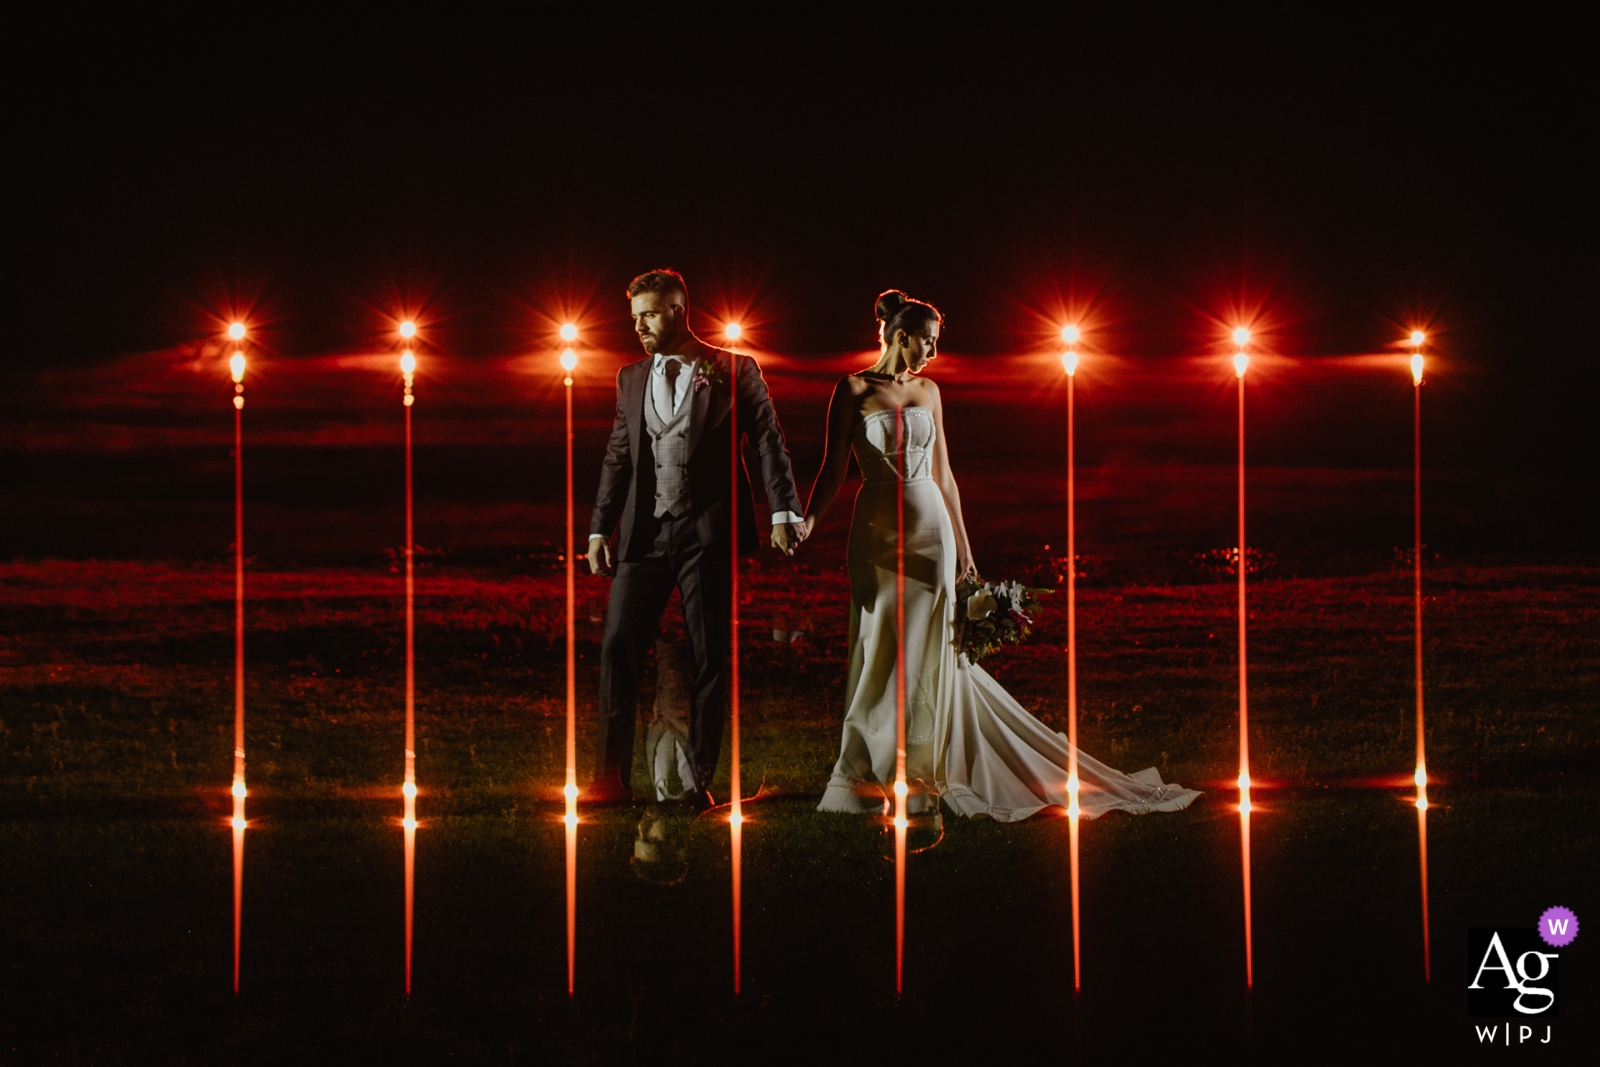 Villa Toscana - Bagé - Brasil  - couple with street lighting and reflex